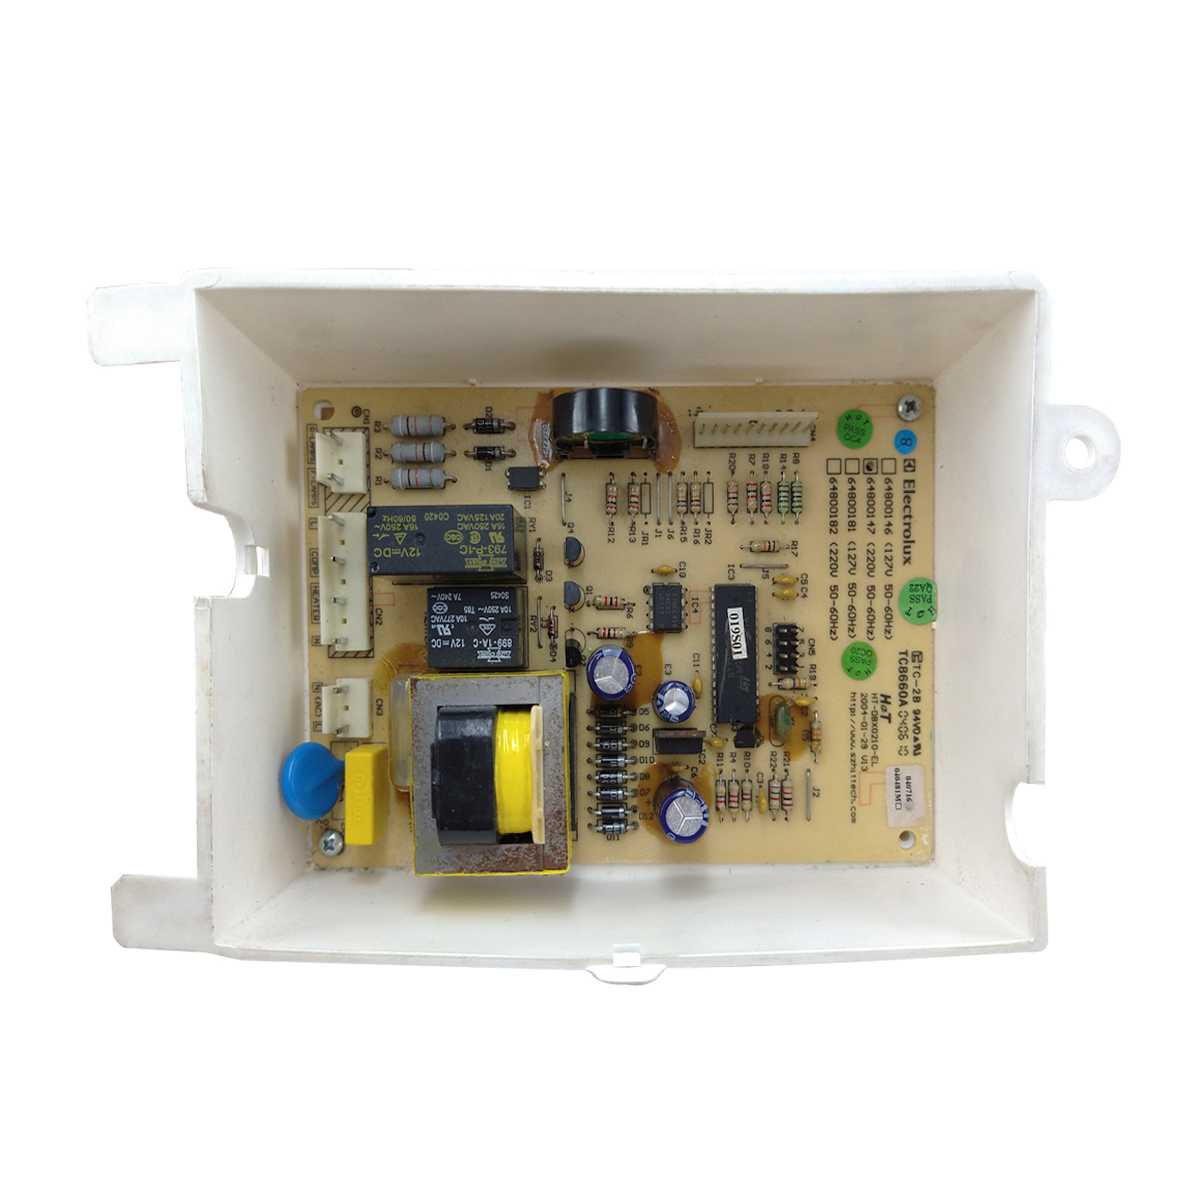 Placa controle eletrônico Geladeira Electrolux 220V DFF40, DFF44, DFF37, DFF39